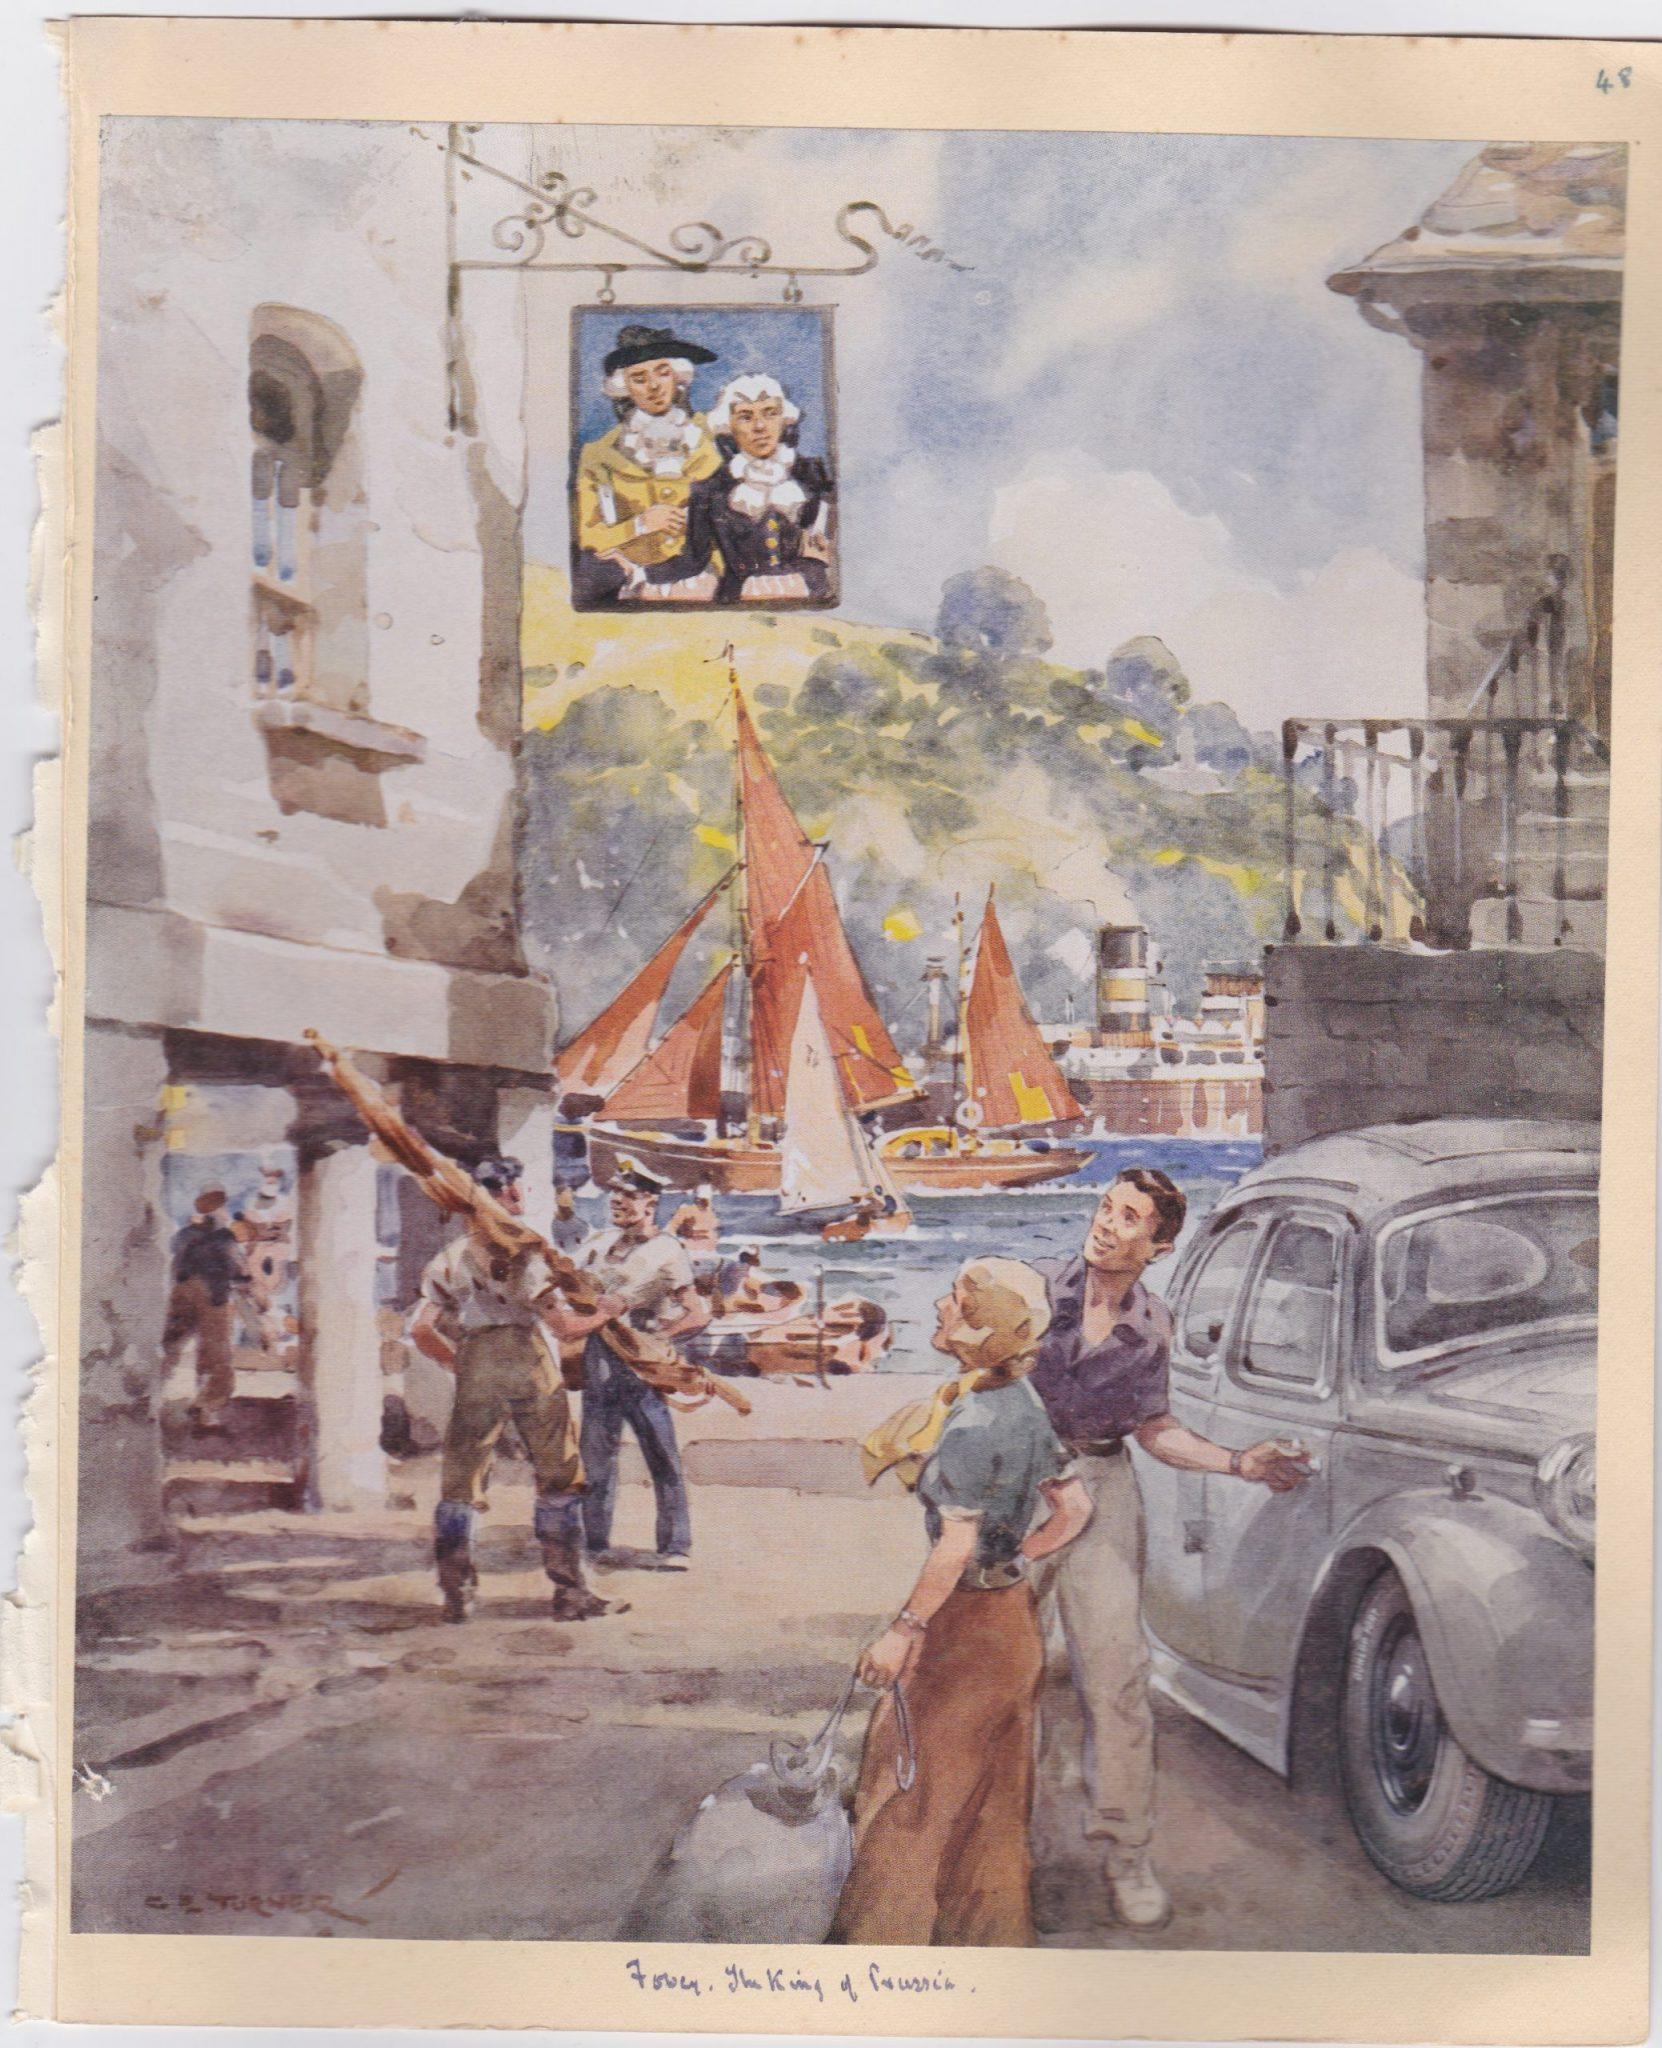 A Pub History Scrapbook Archive 15